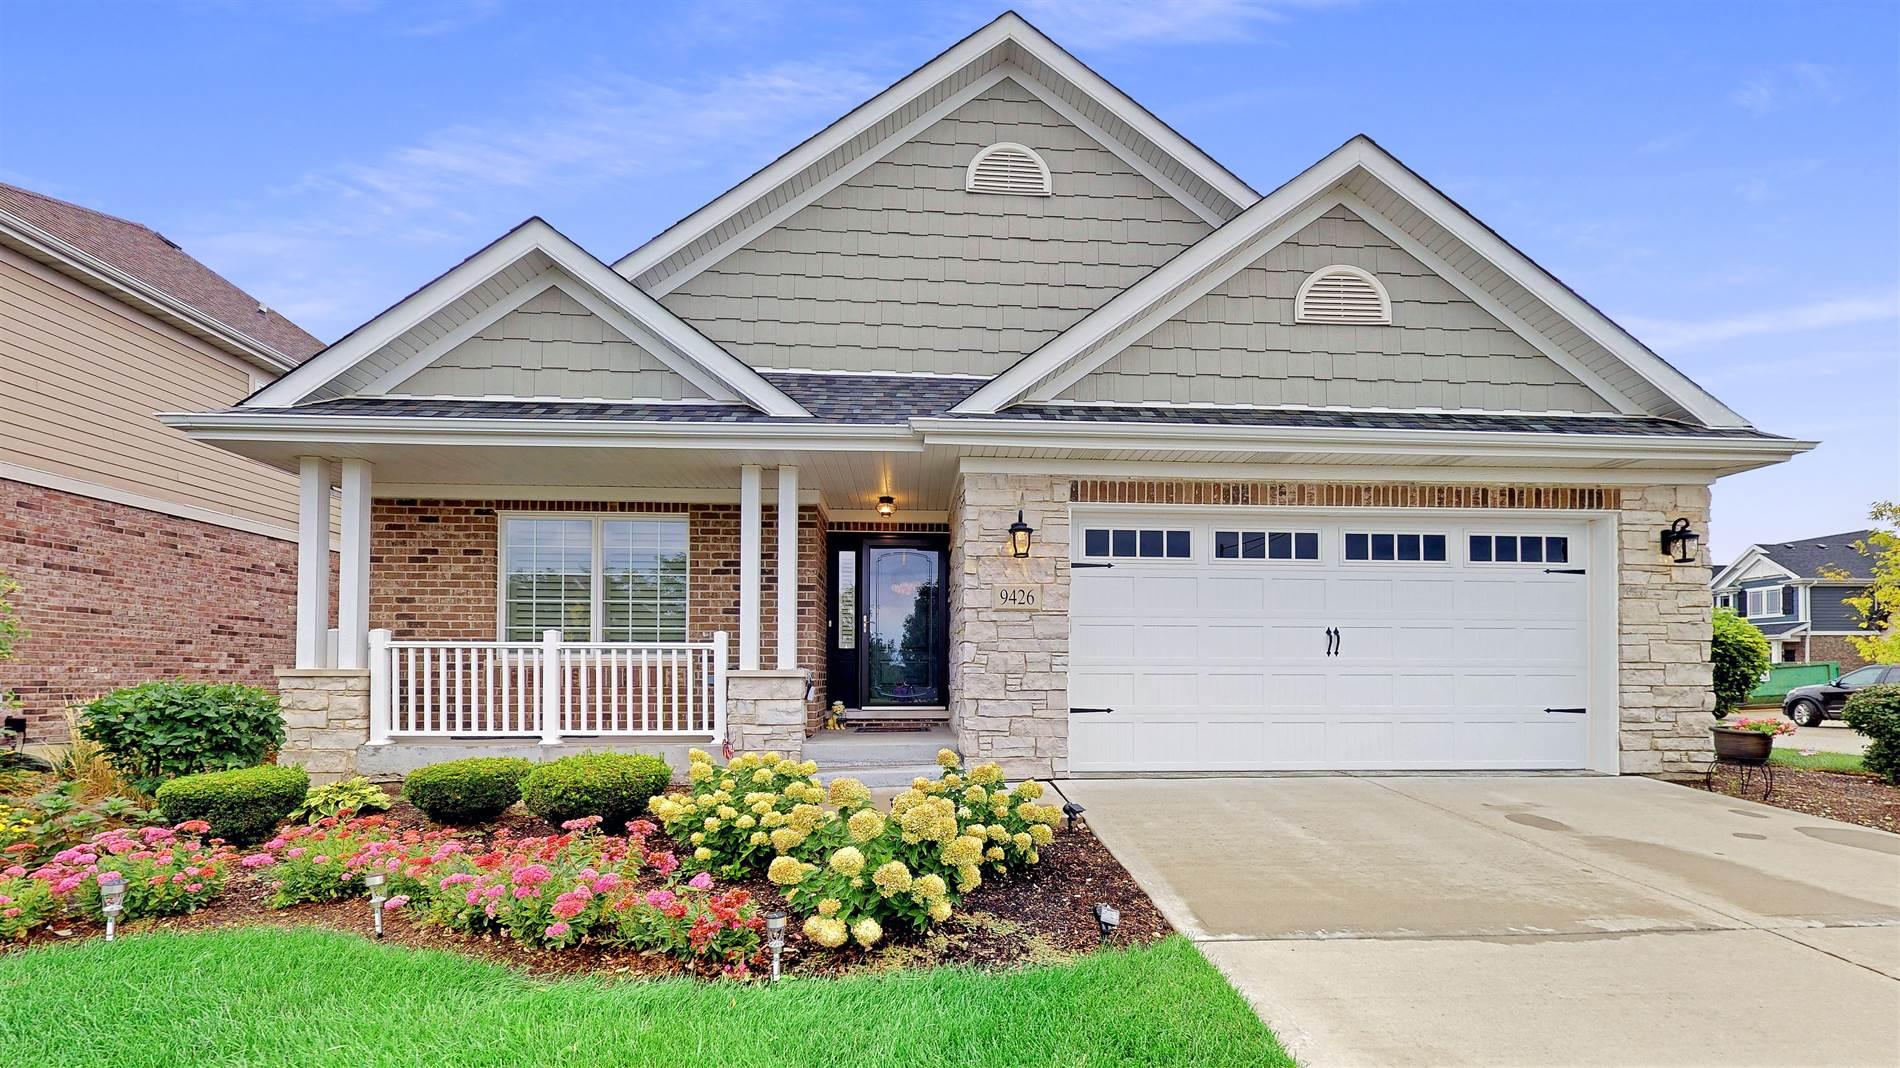 9426 Maria Lane, Orland Park, IL 60467